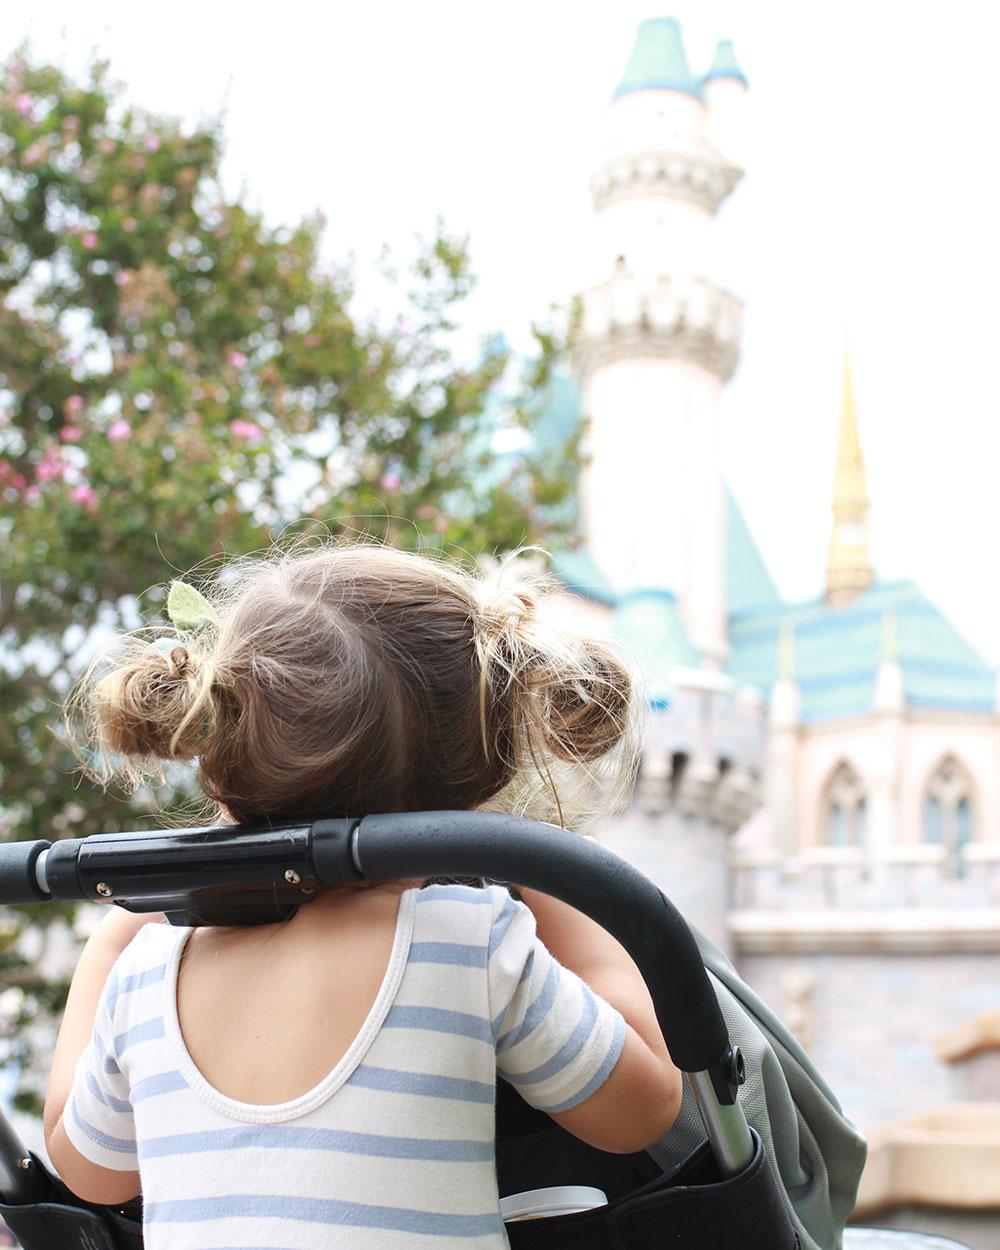 exploring disneyland with 3 kids ages 6 + under | thelovedesignedlife.com